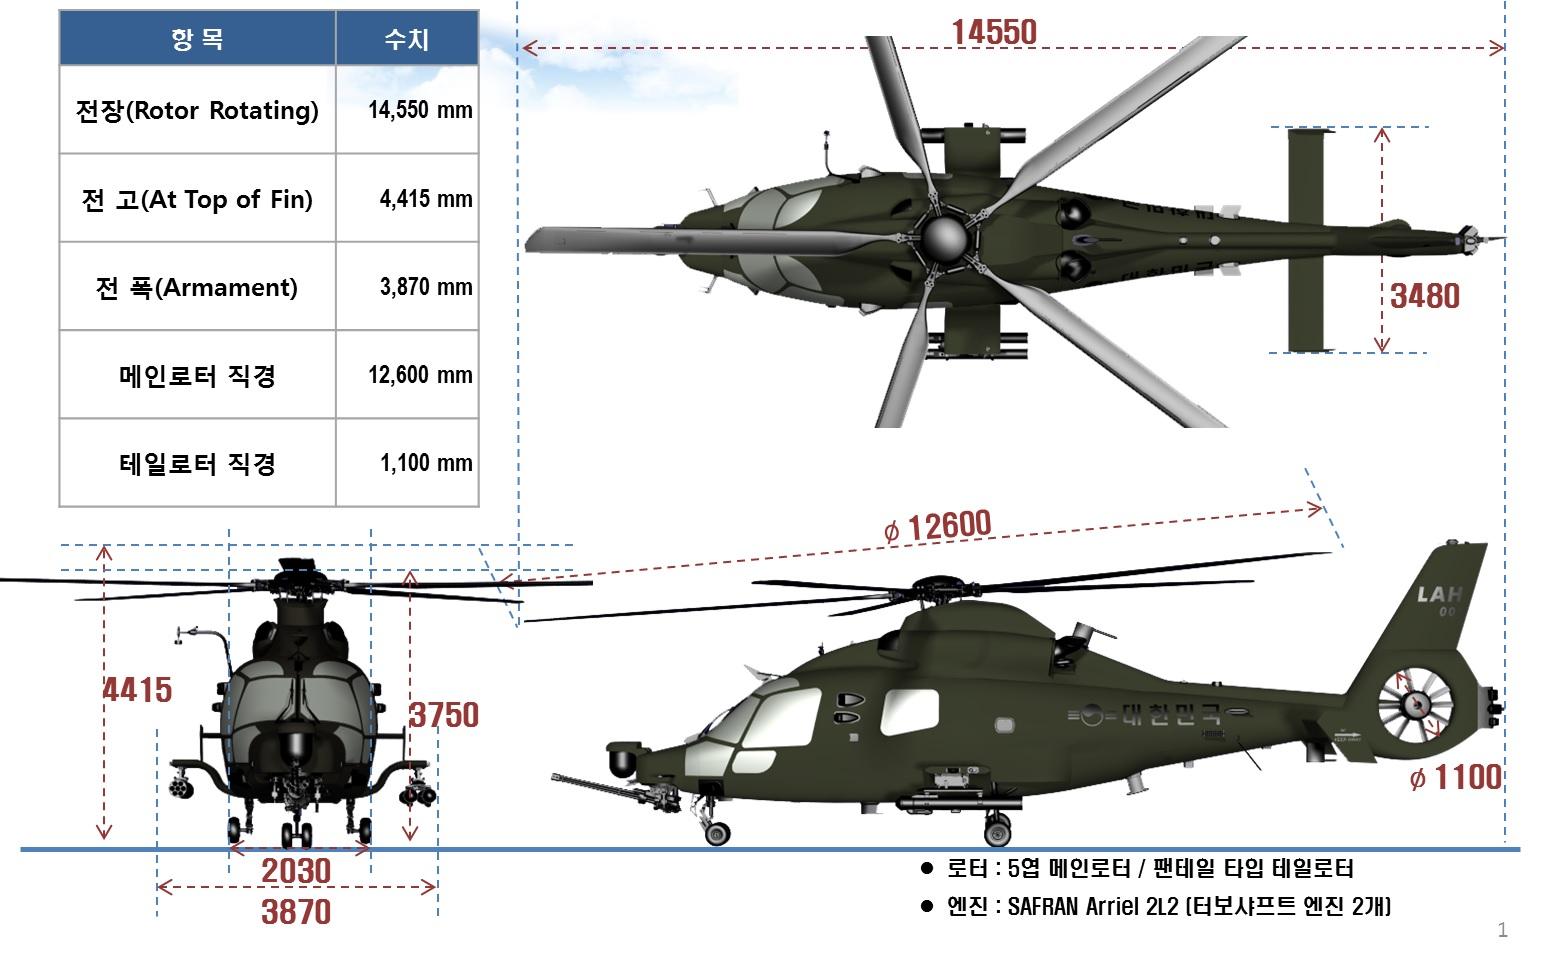 South Korea Armed Forces - Page 3 6326843_original